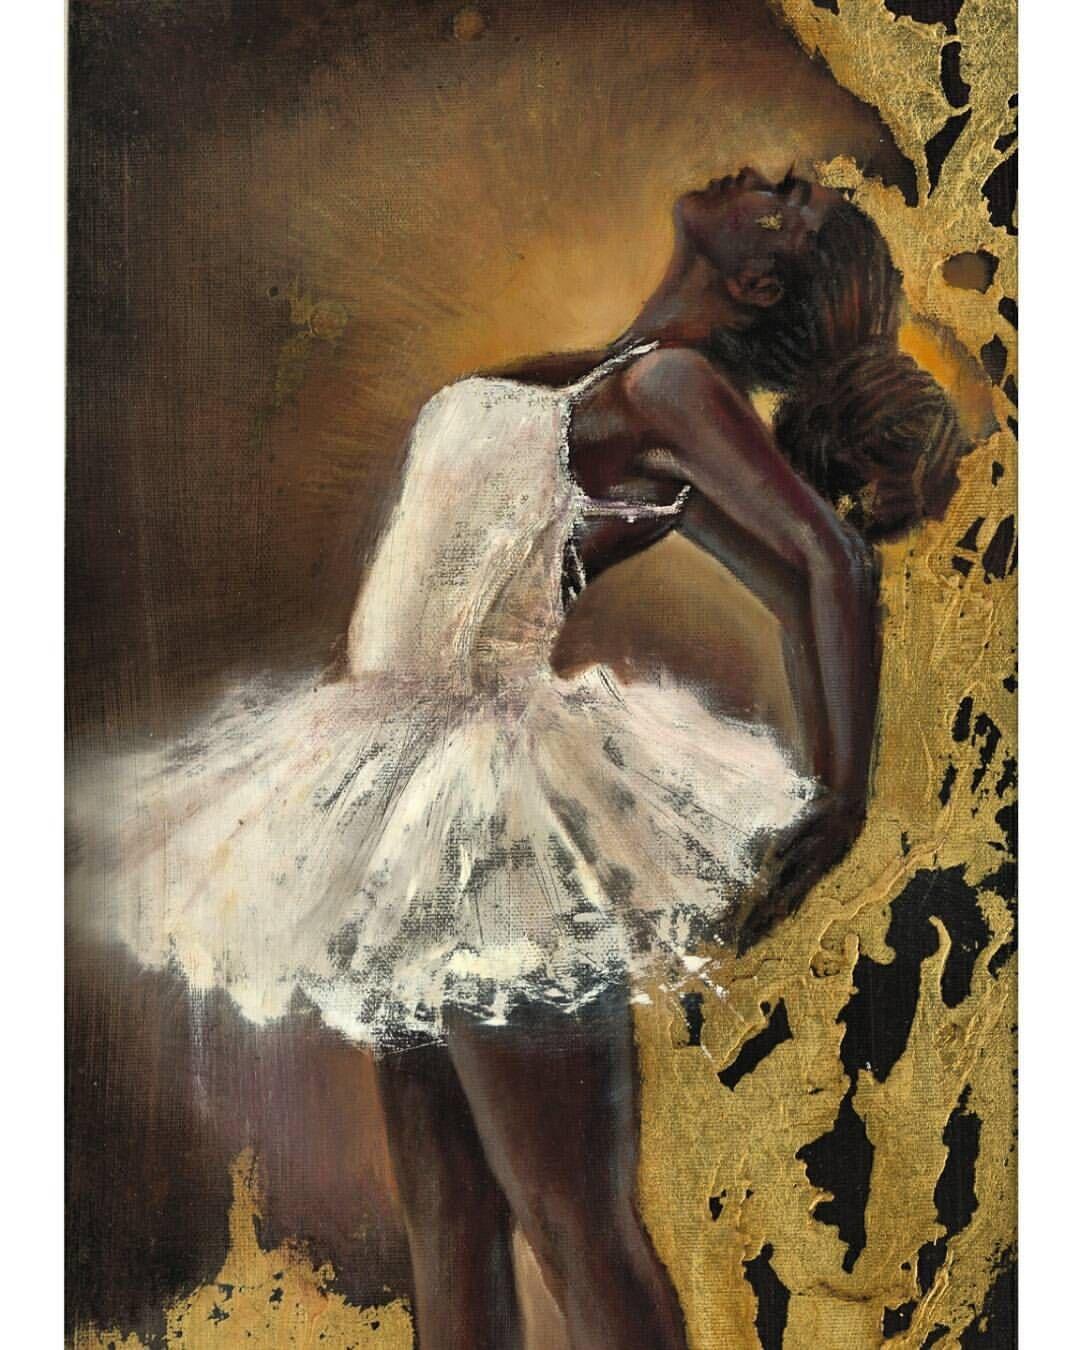 Pin Herlucidsky Afro-textured Art